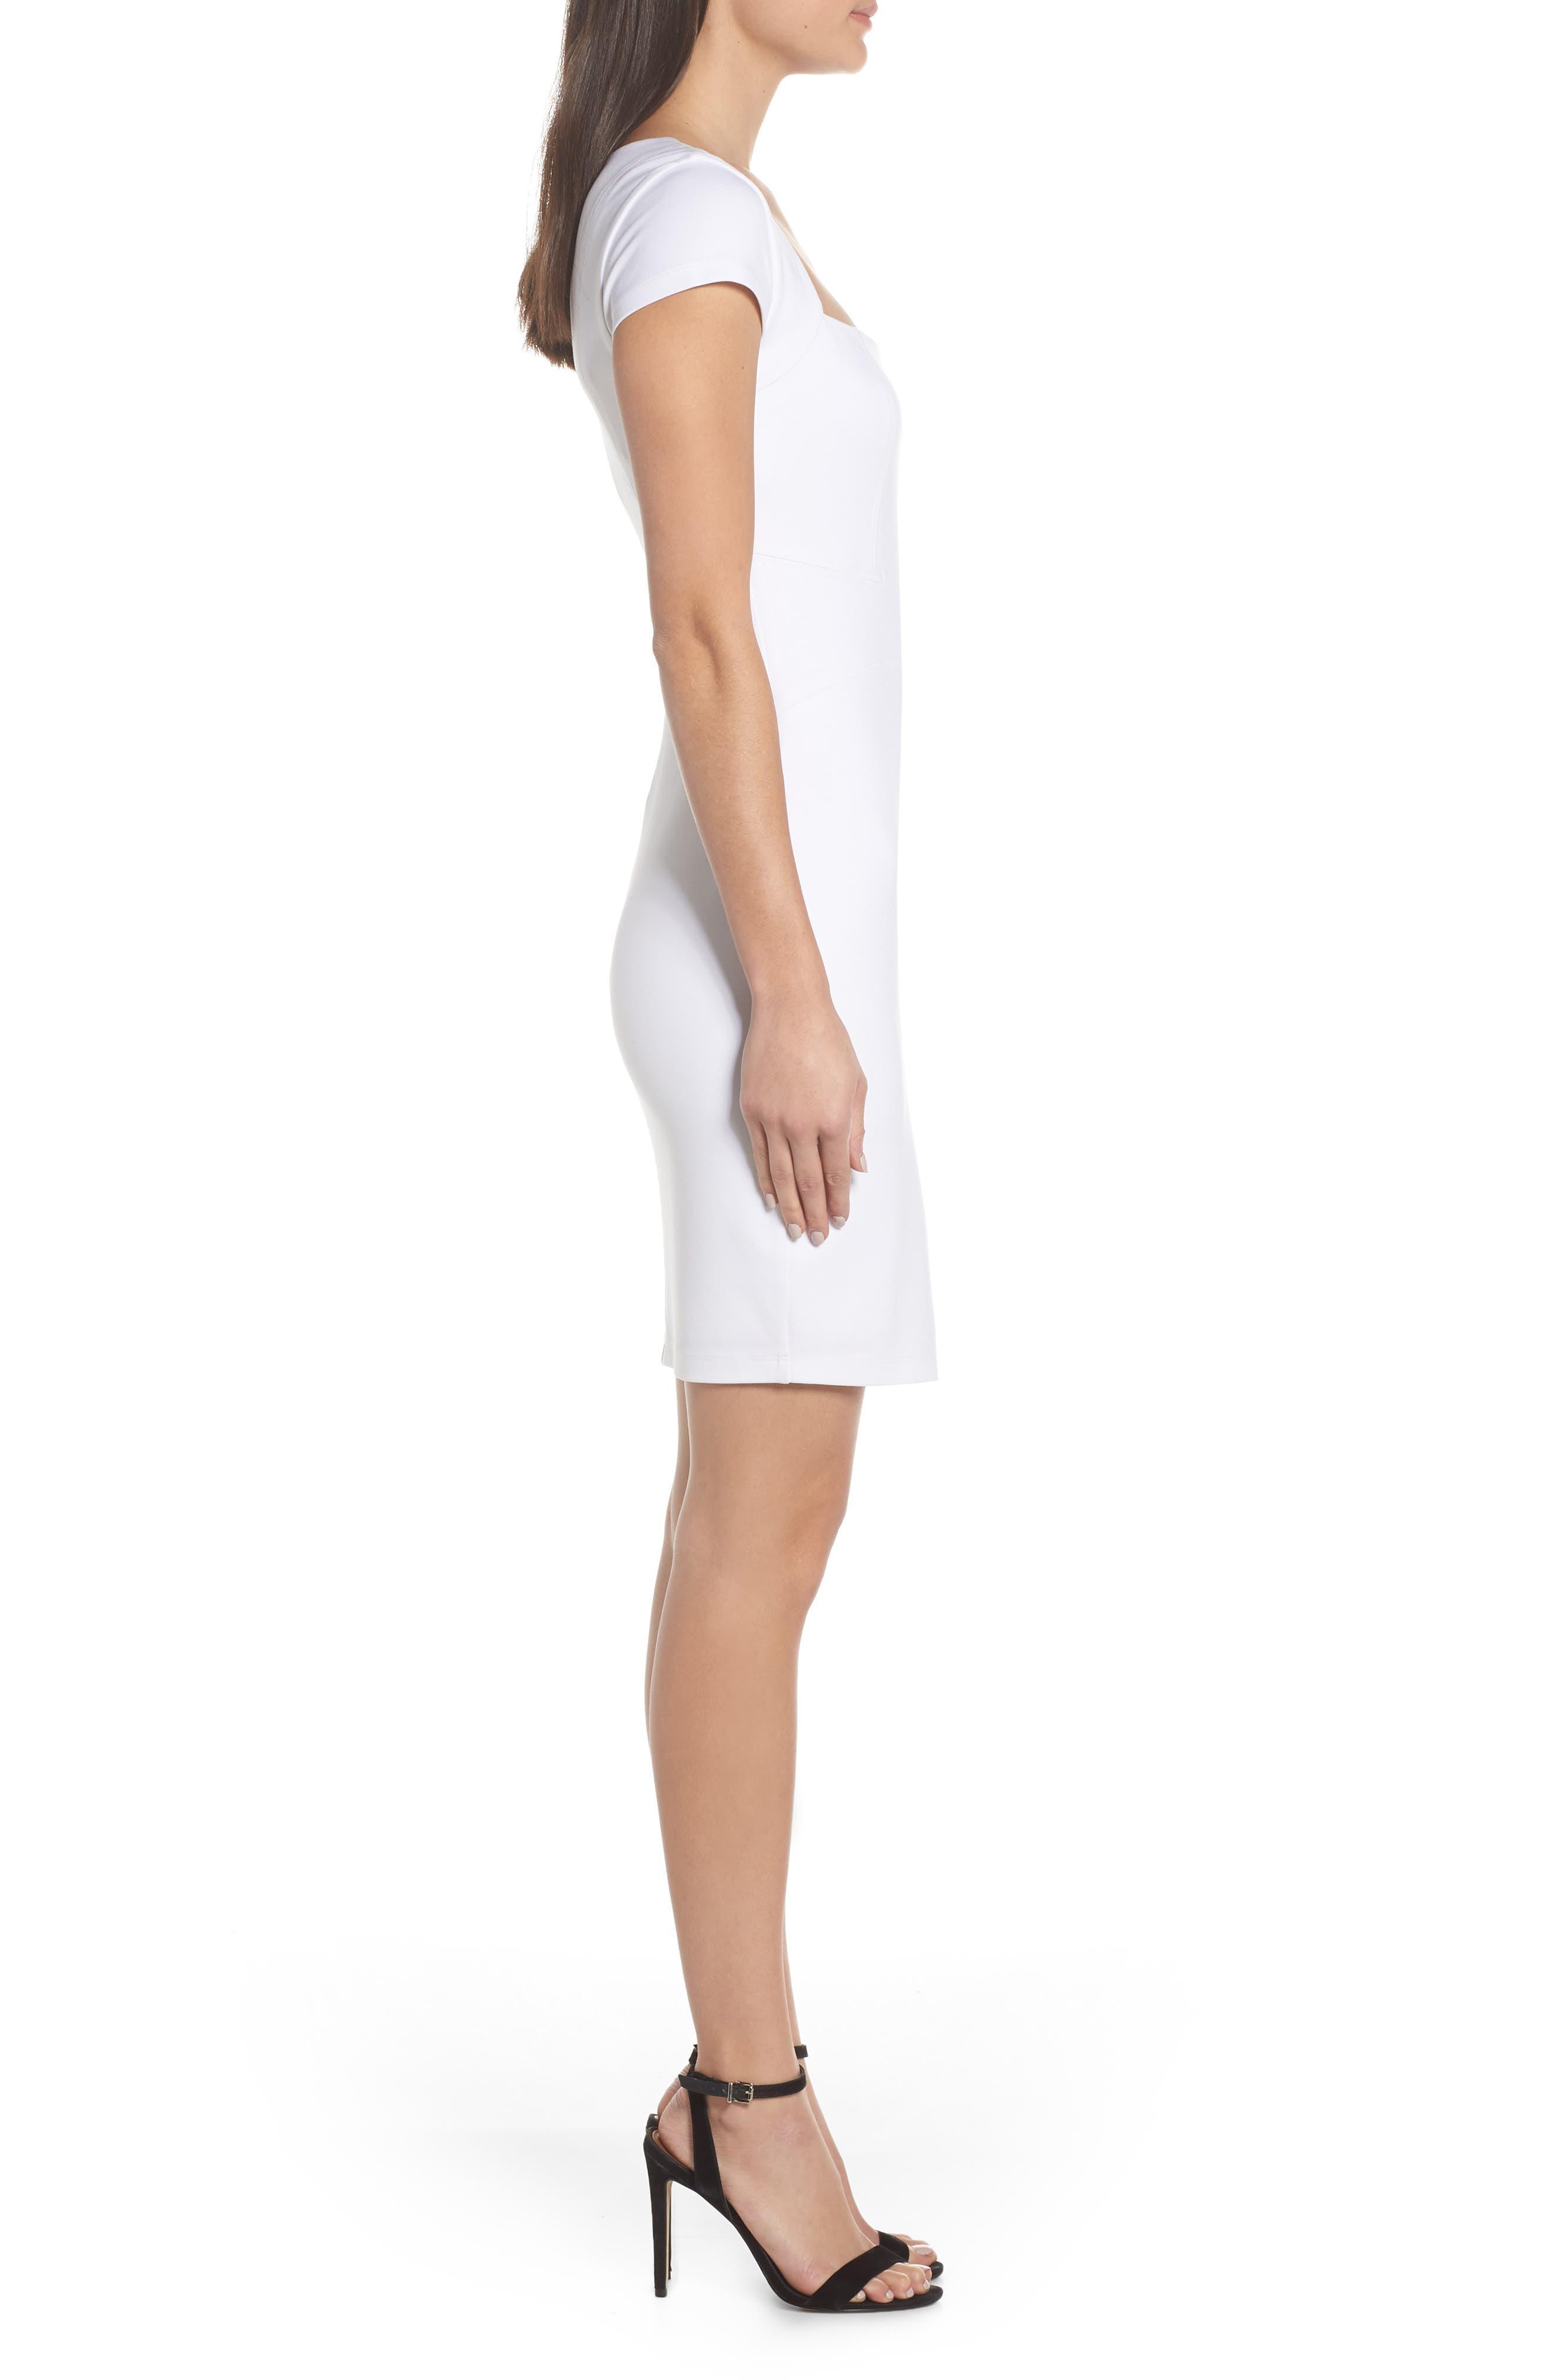 ALI & JAY, Olive Street Body-Con Dress, Alternate thumbnail 4, color, WHITE